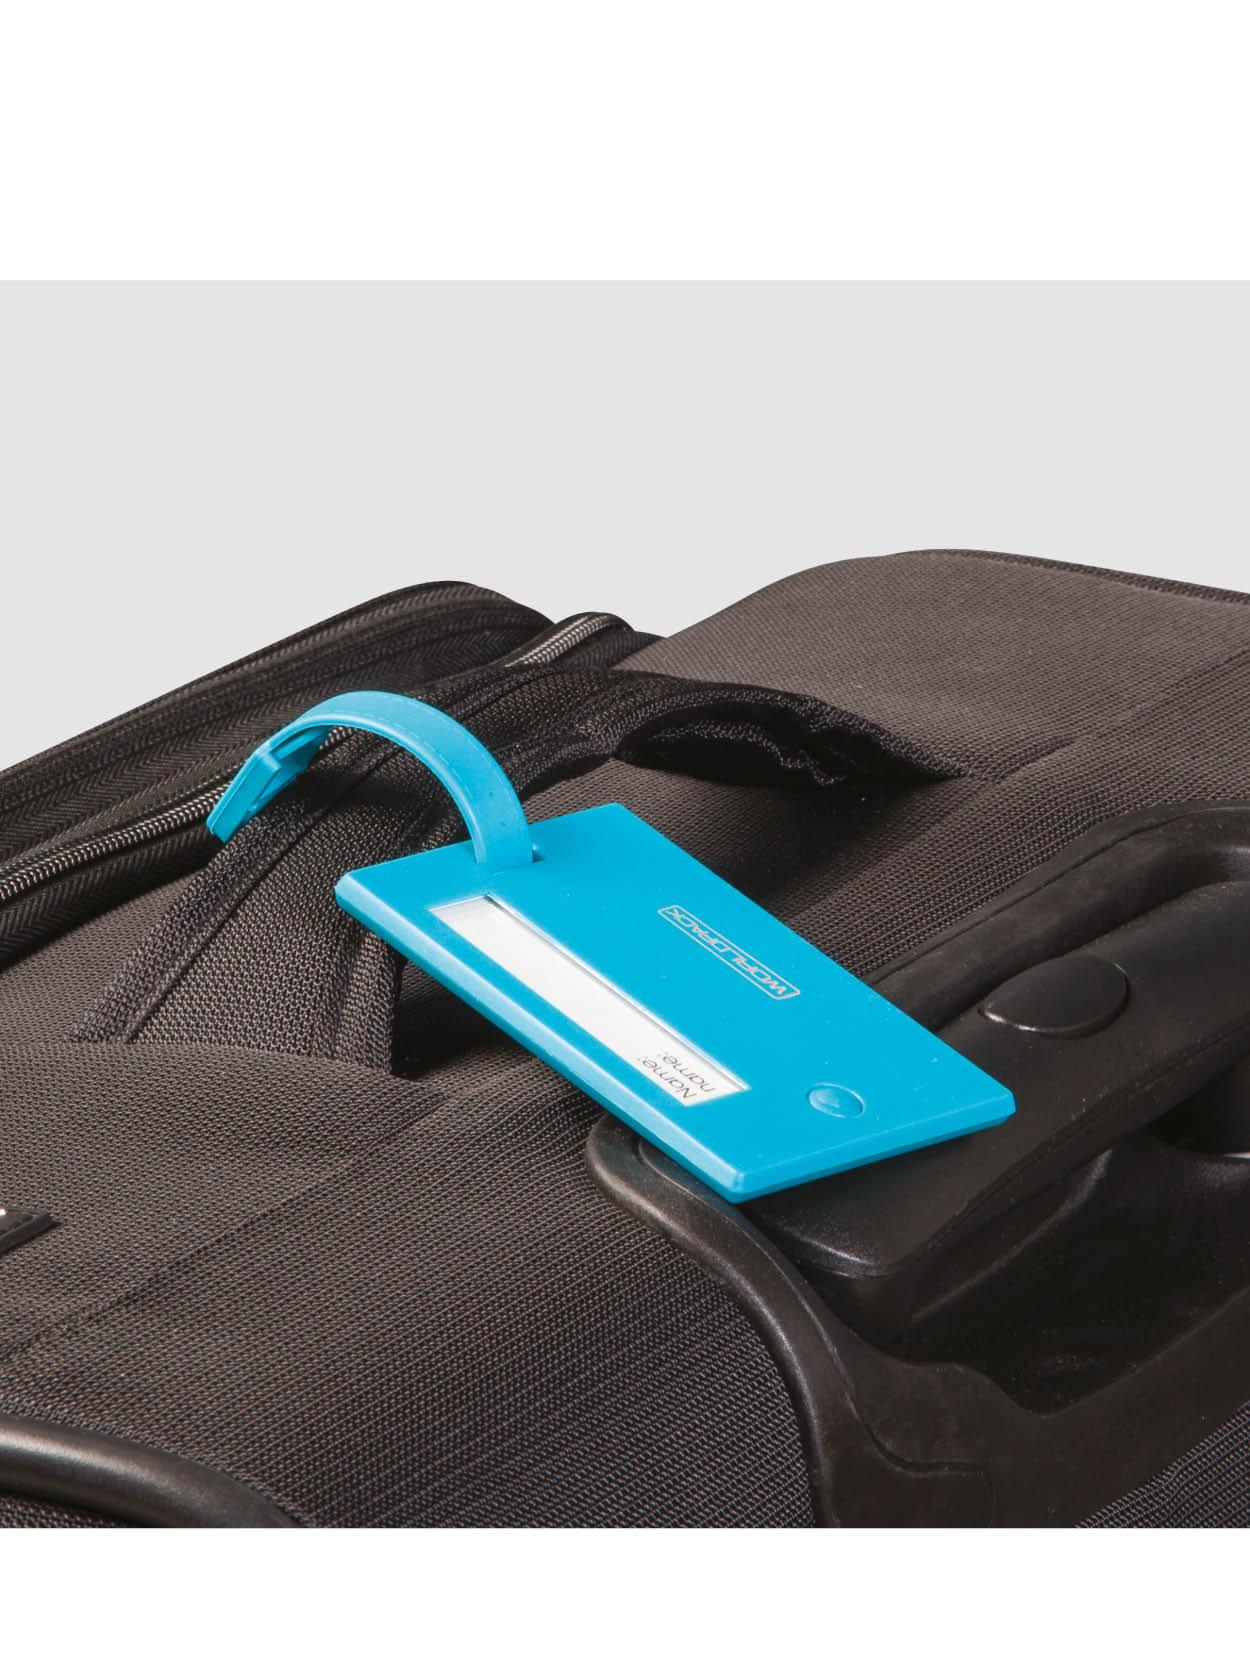 Worldpack-Accessoires-neu-3